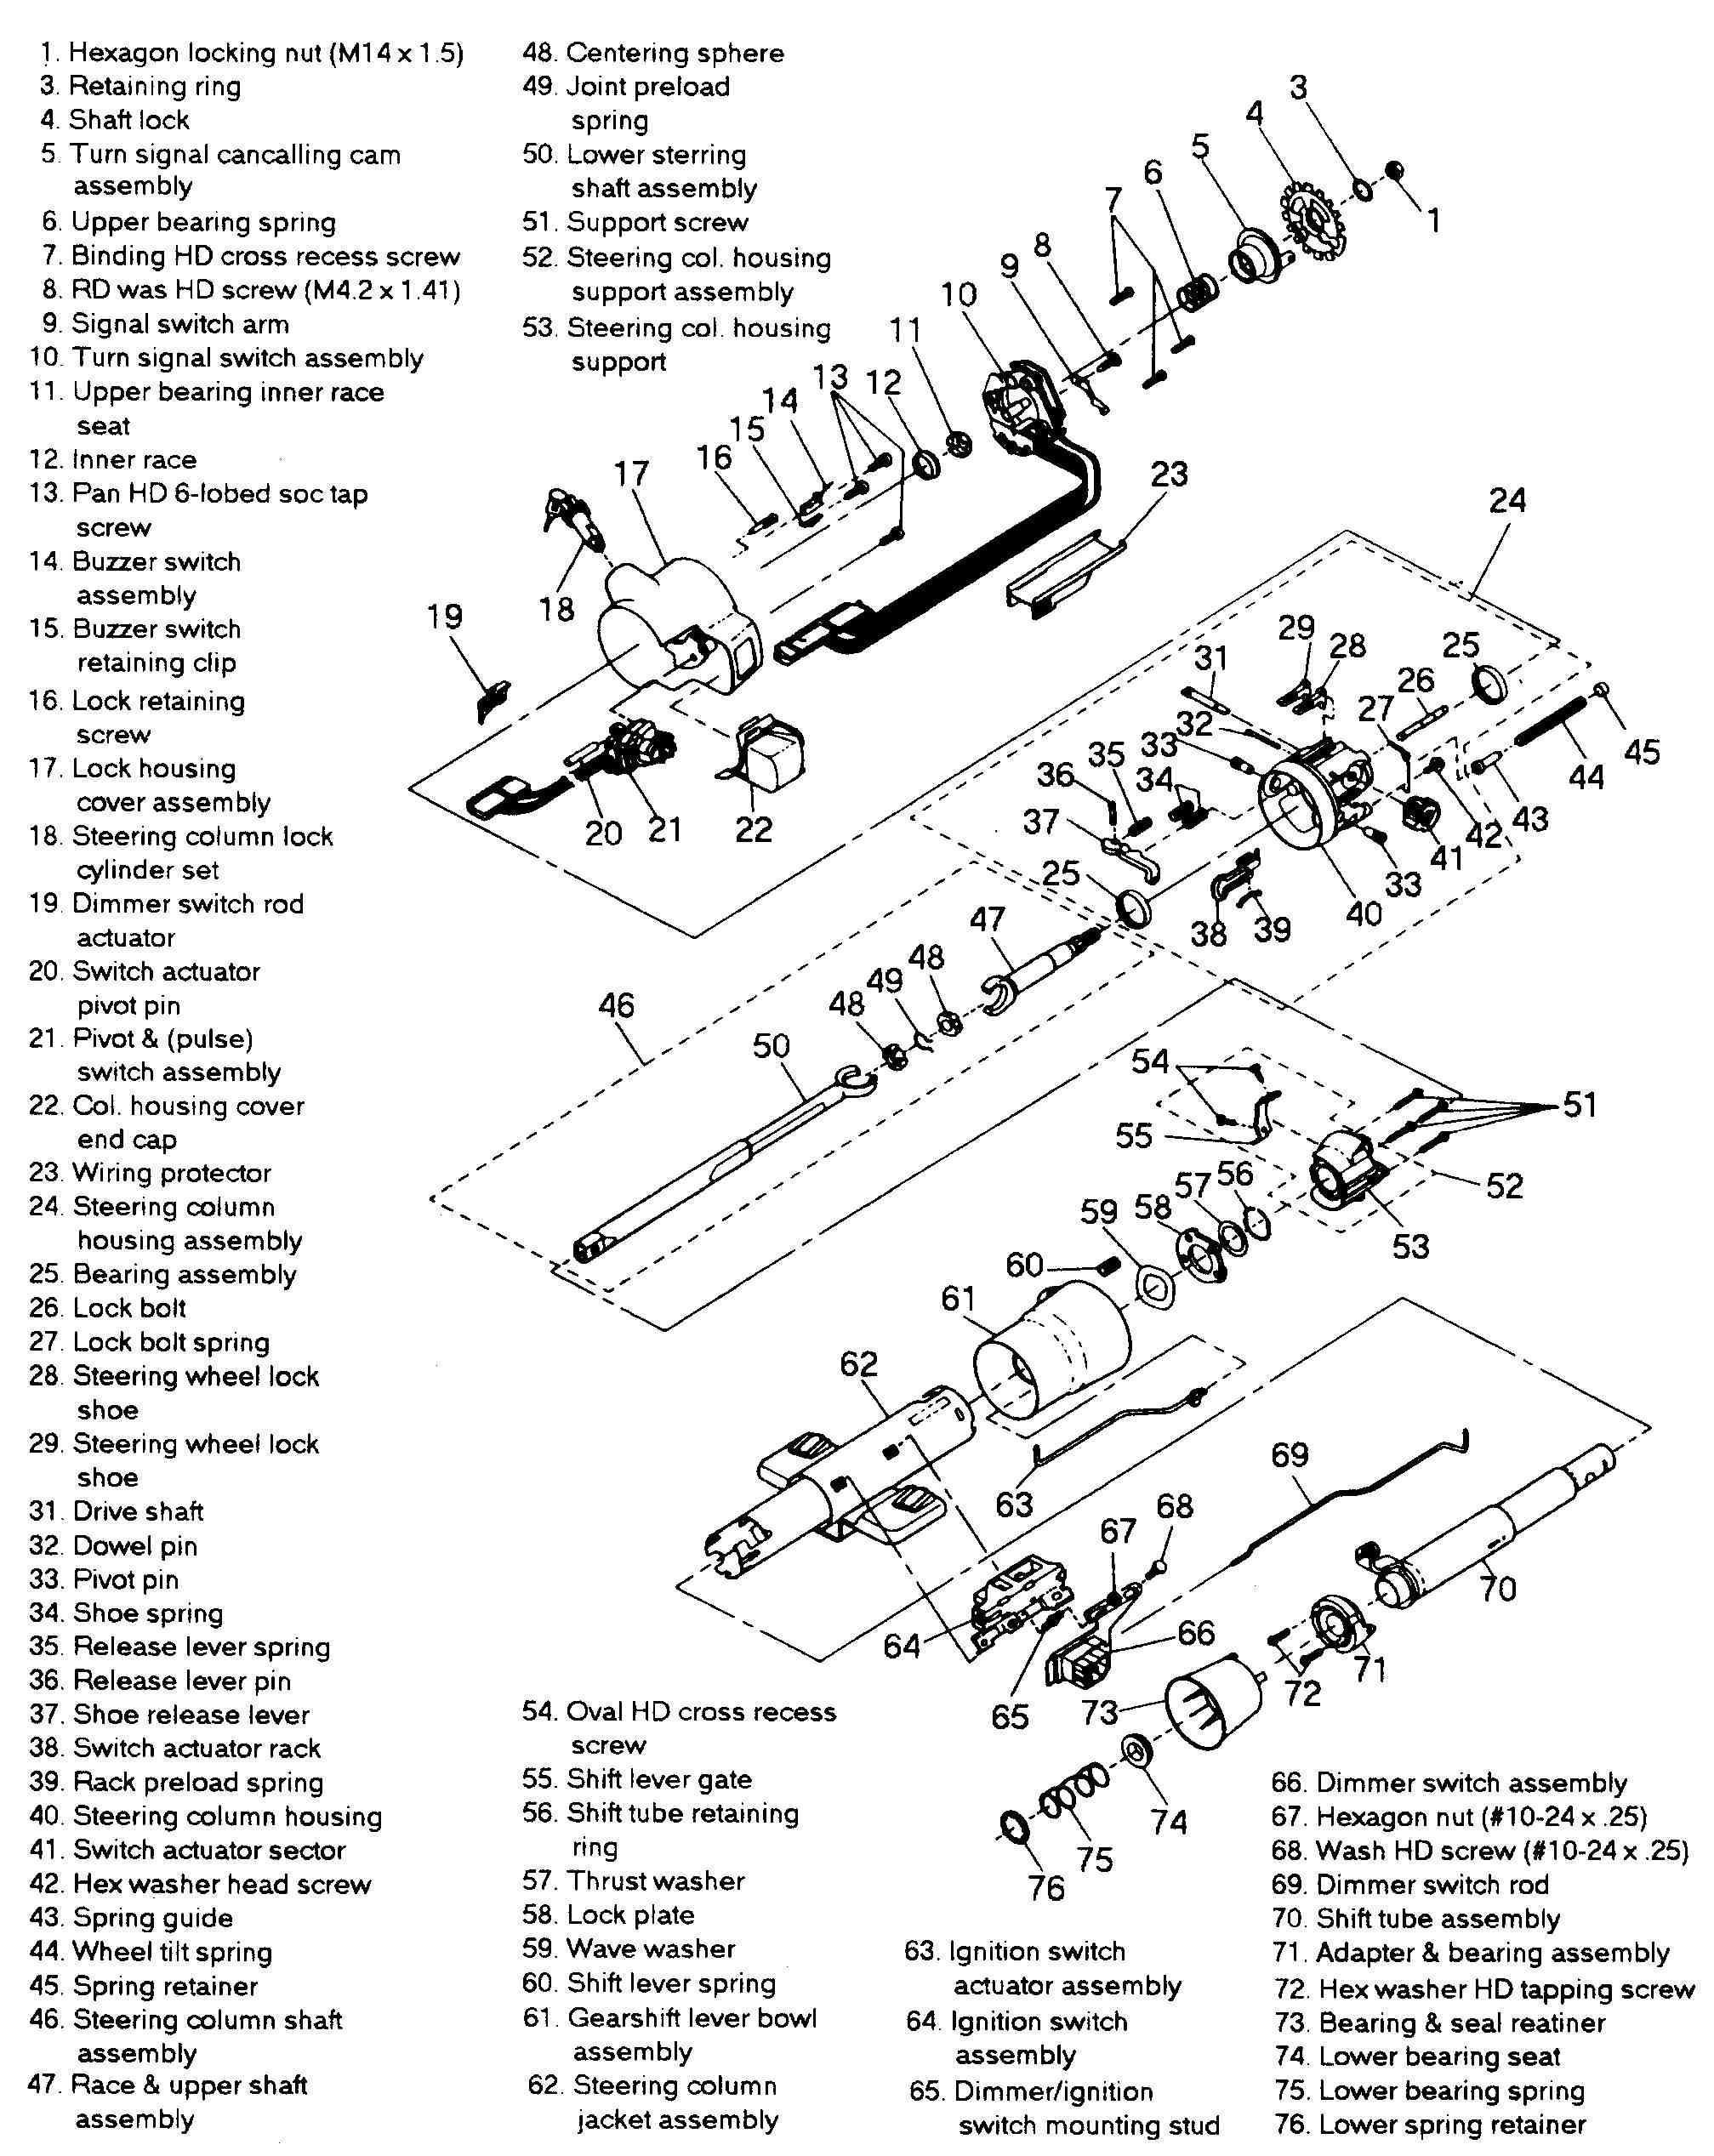 chevrolet steering column wiring diagram sm 6337  steering column wiring diagram moreover 1988 chevy truck  steering column wiring diagram moreover